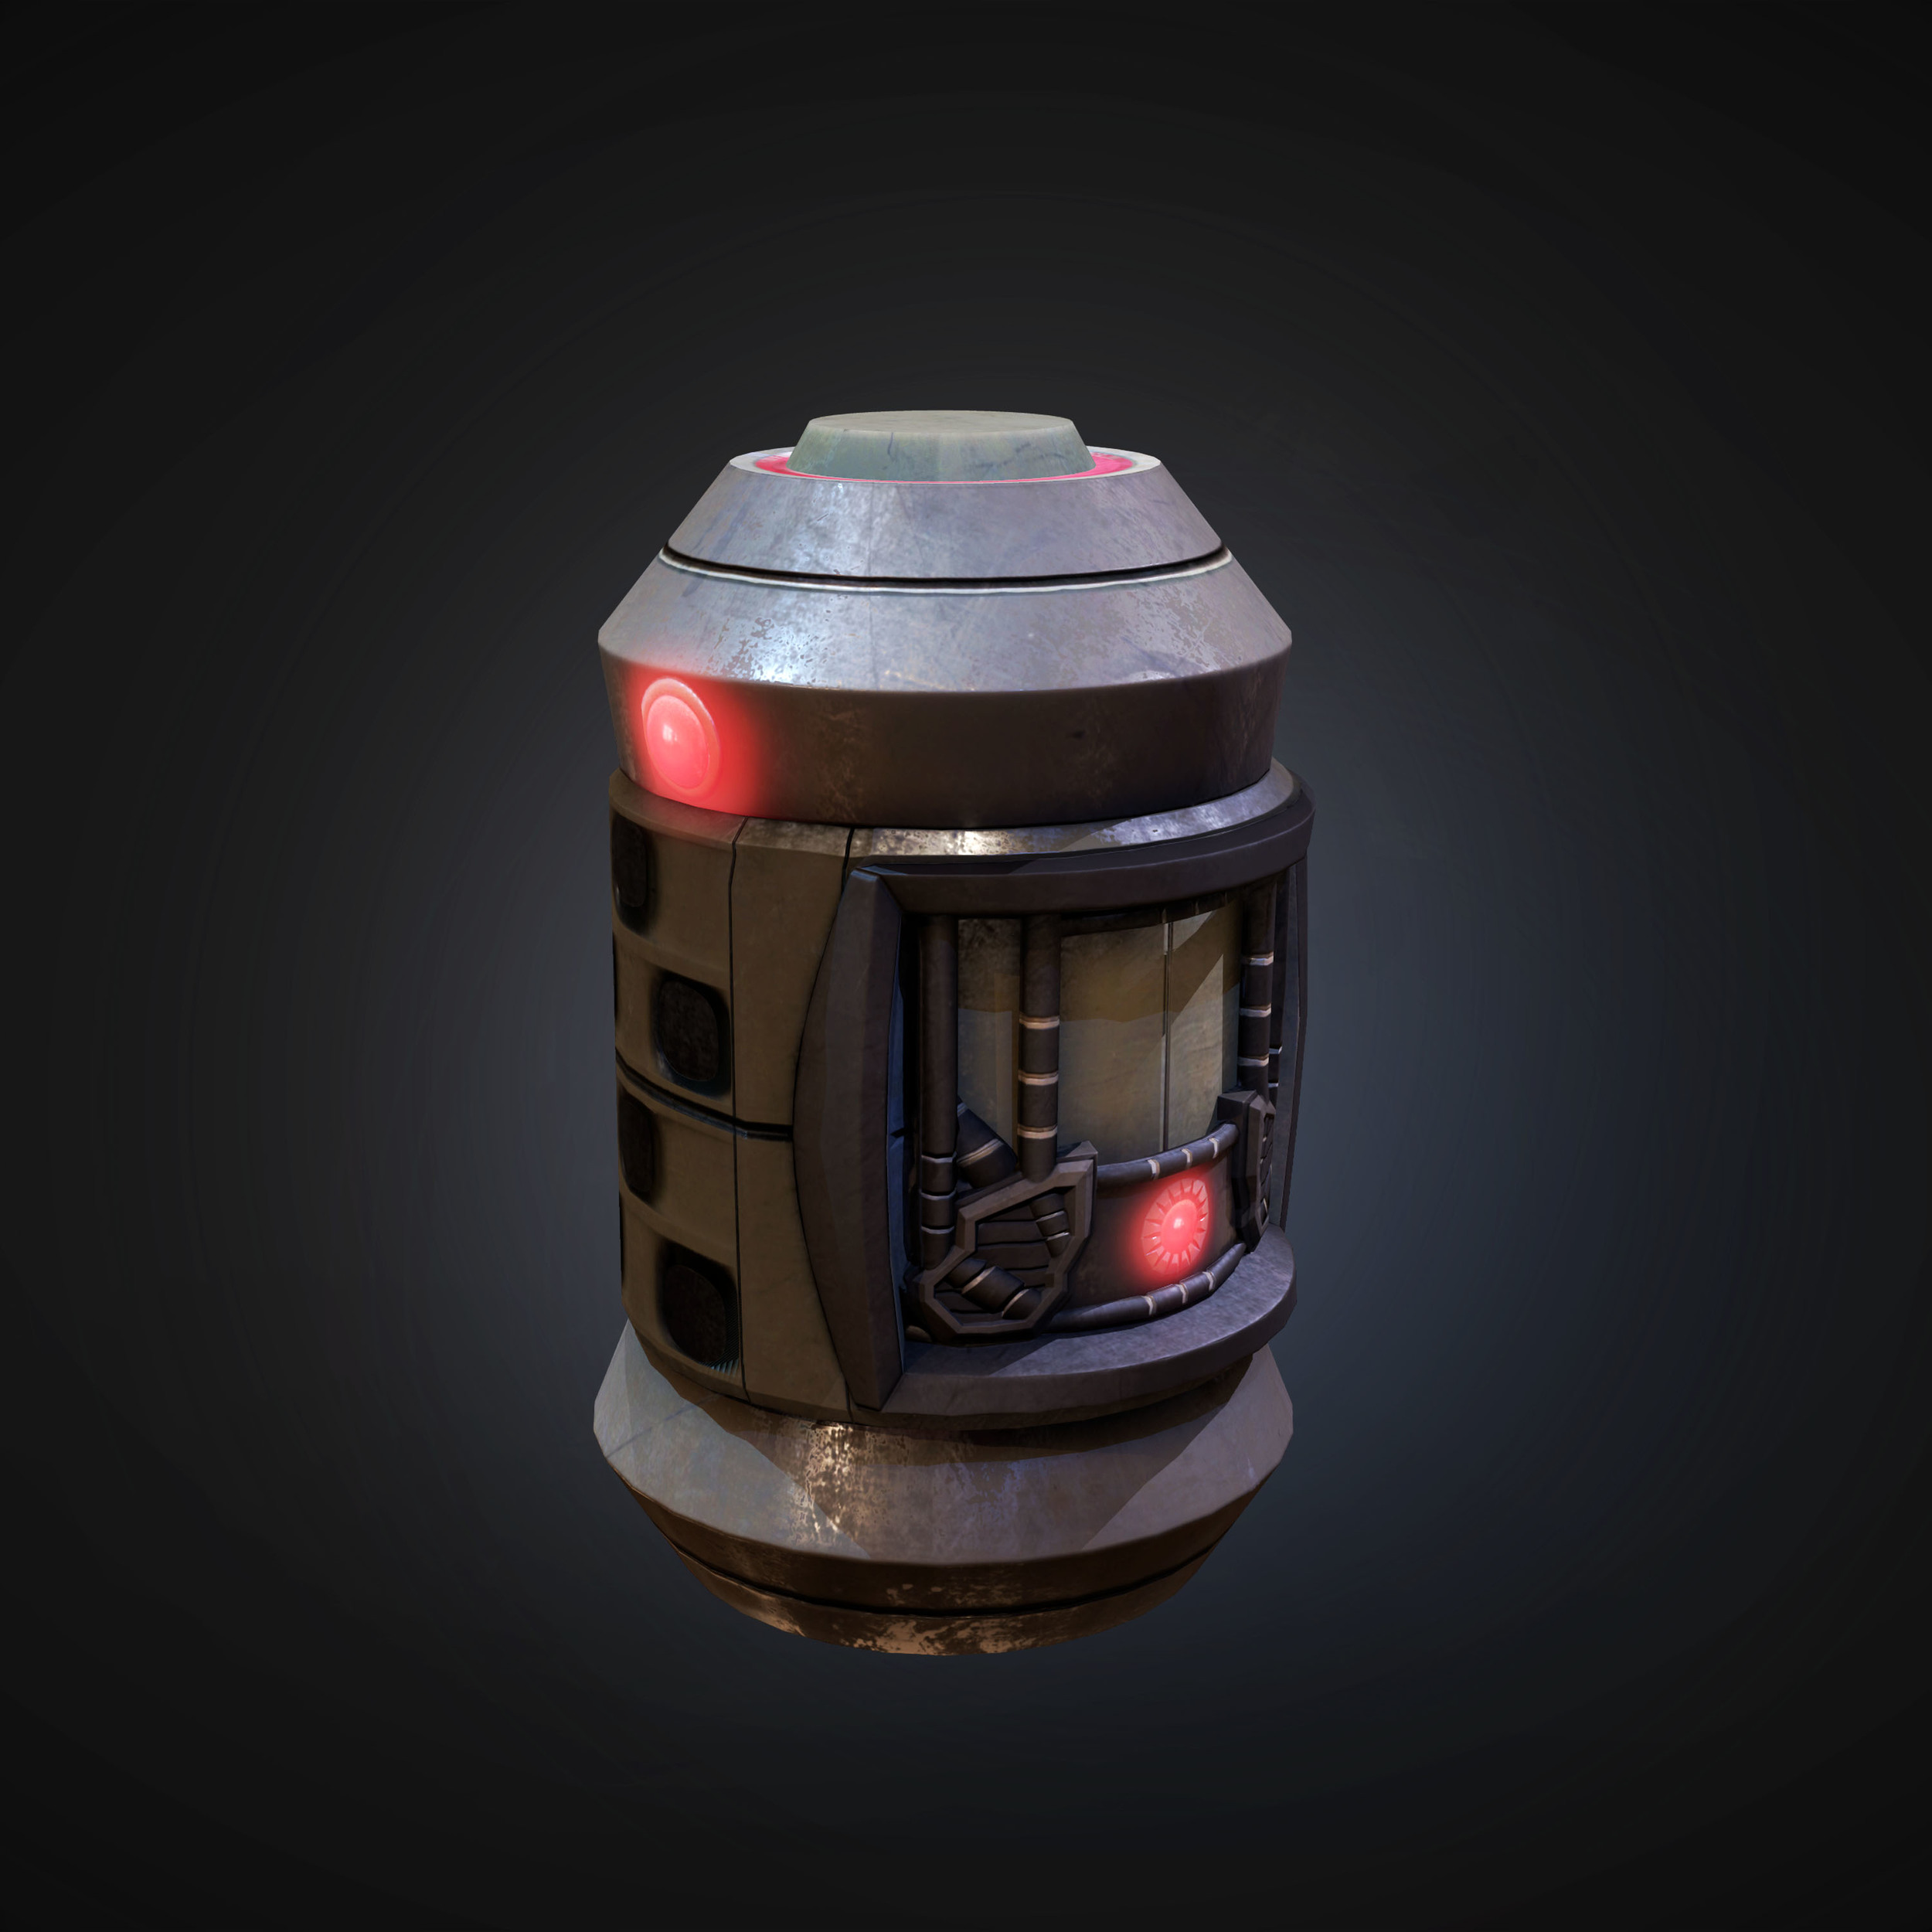 Grenade_Lowpoly_Angle_ST1.jpg